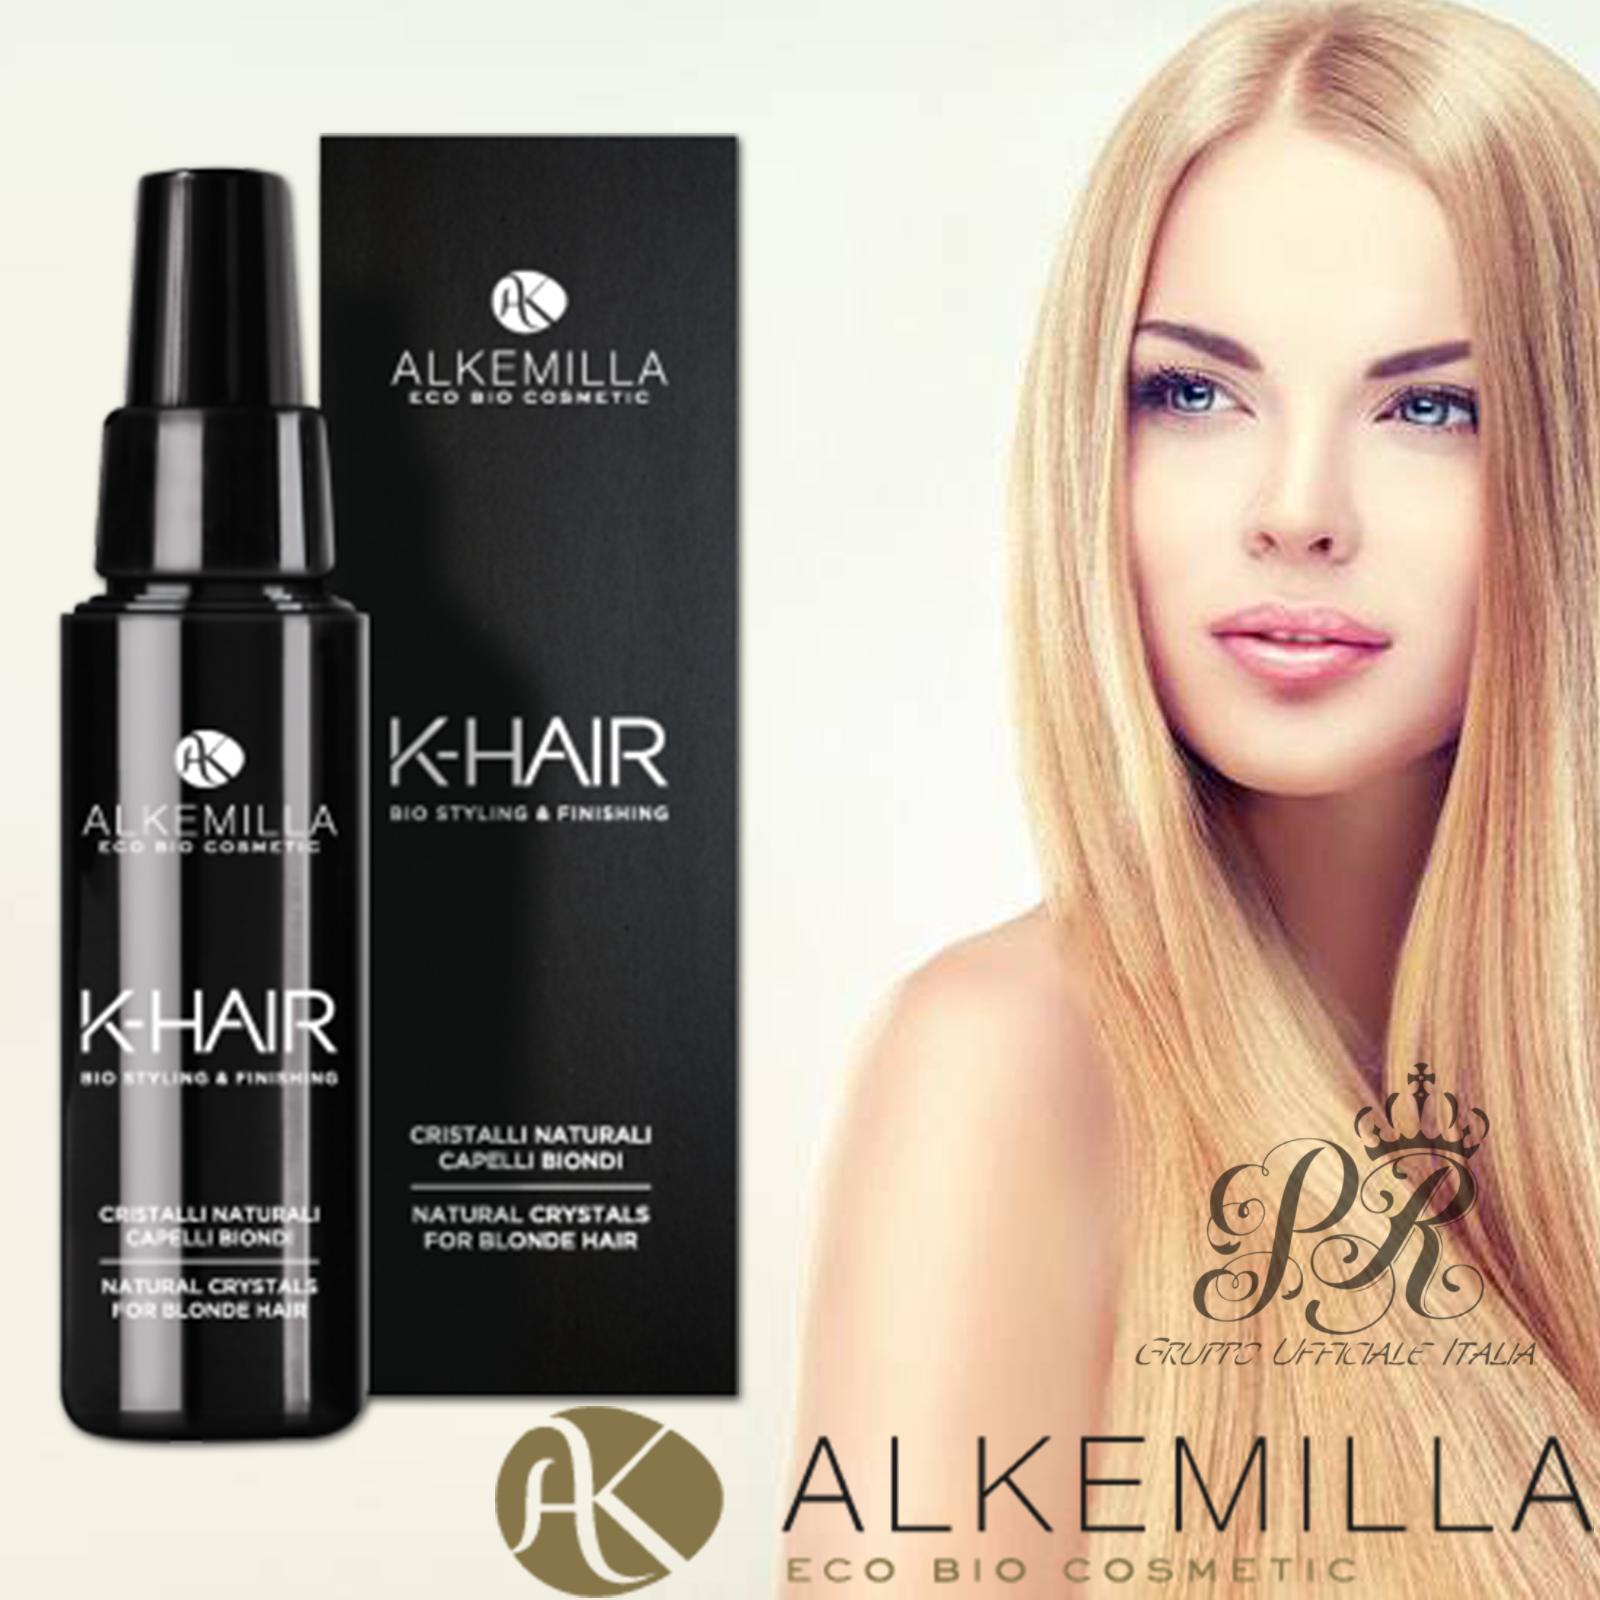 Alkemilla Cristalli Naturali per capelli biondi K-Hair